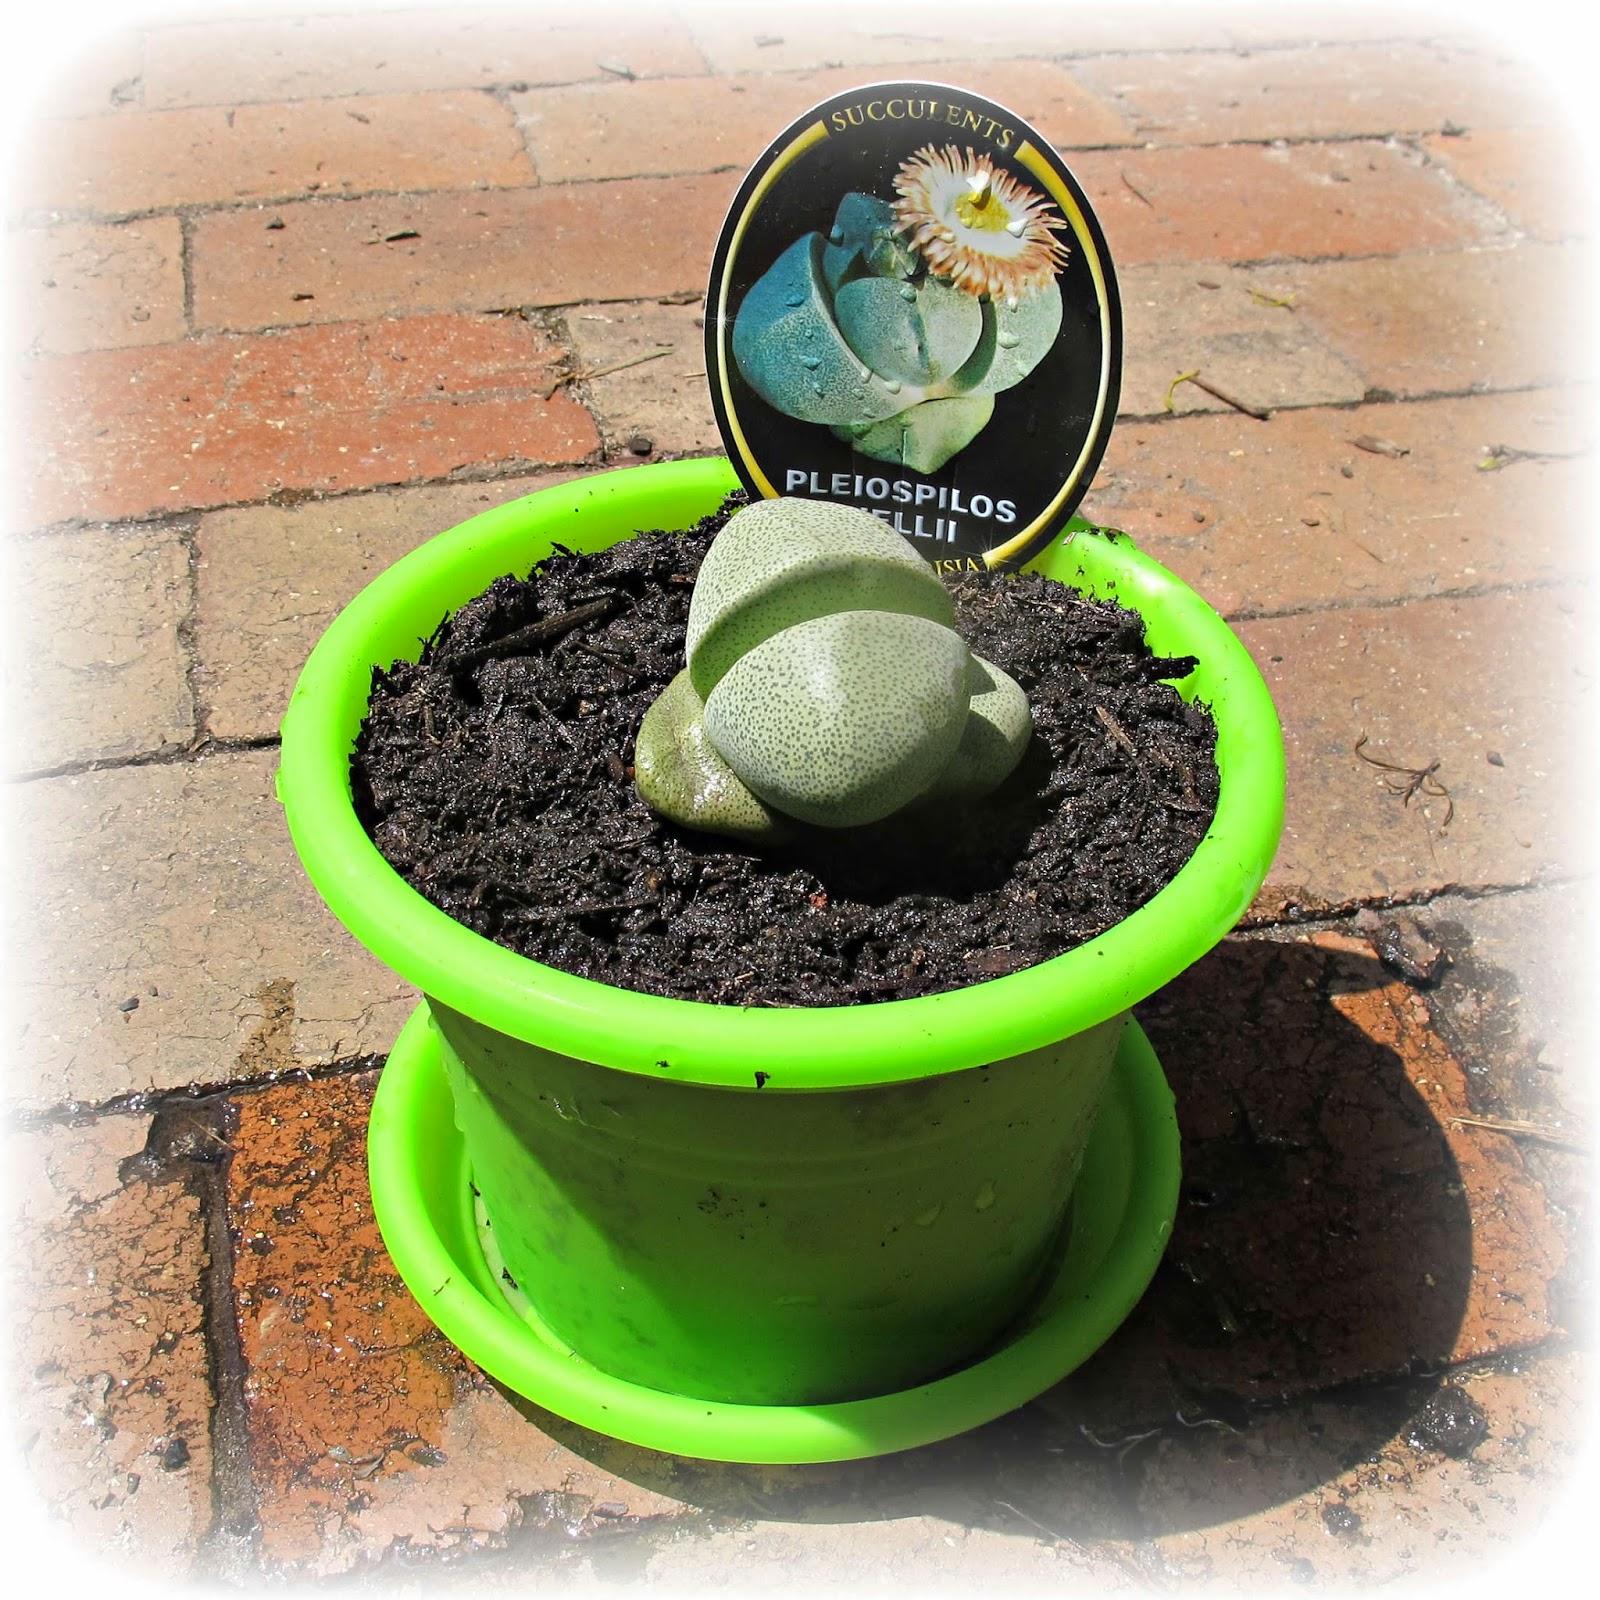 image split rock plant pleiospilos nelii